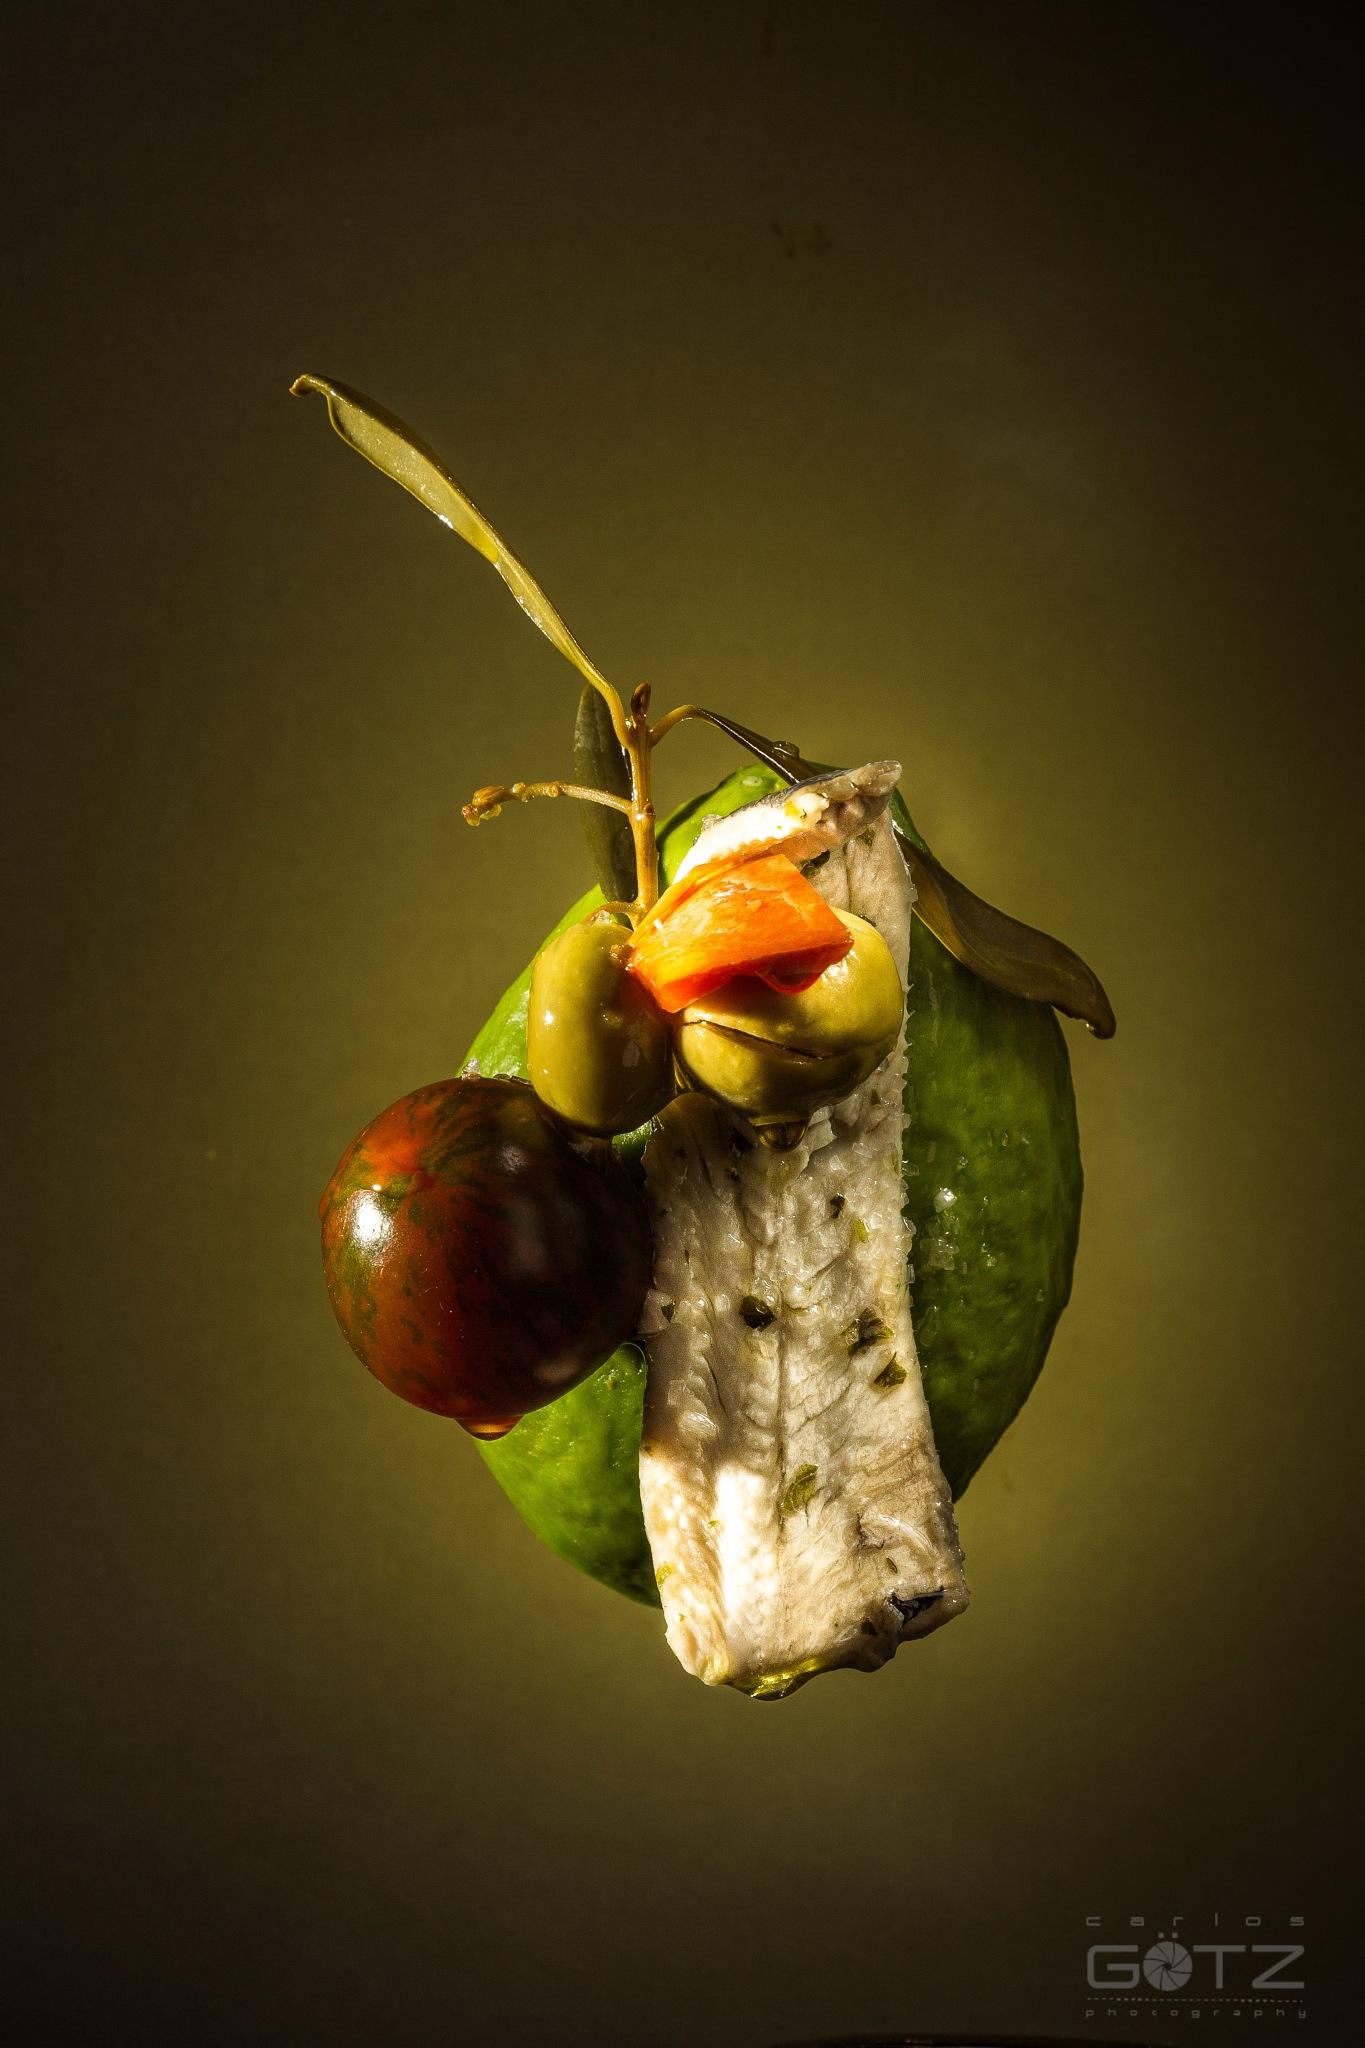 Ensalada vertical by CarlosGoetzPhotography